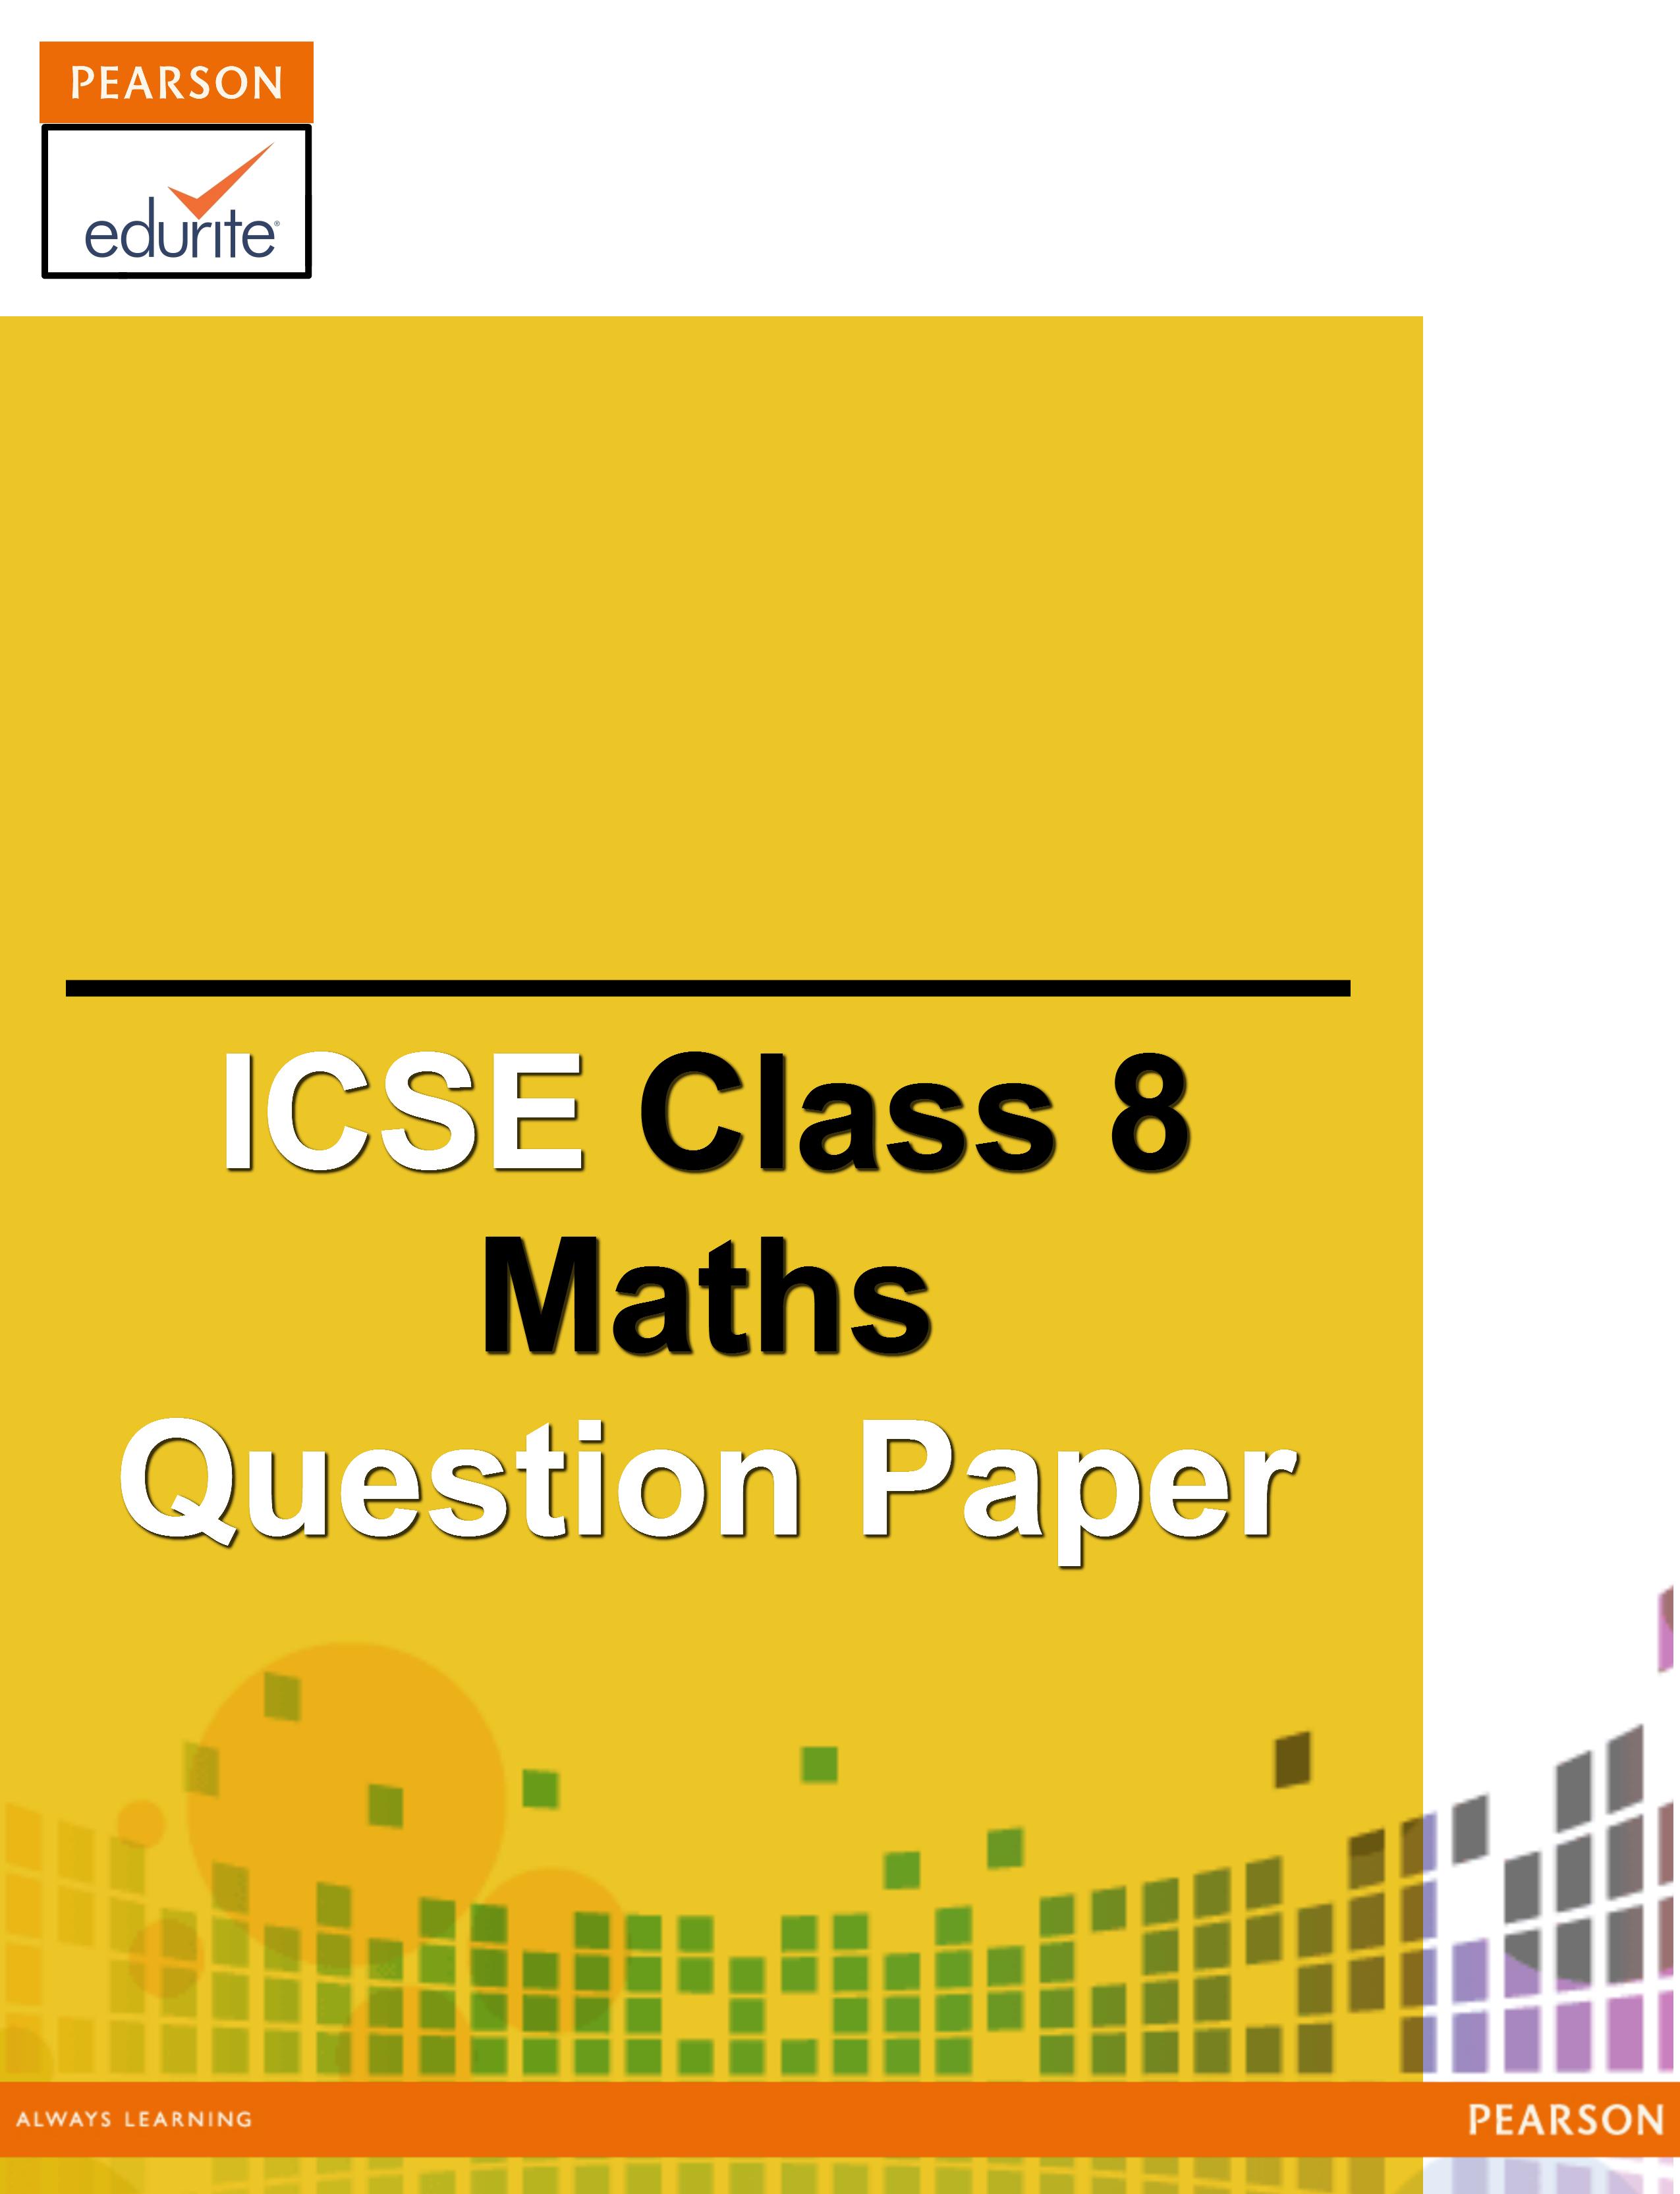 Icse Class 8 Maths Question Paper